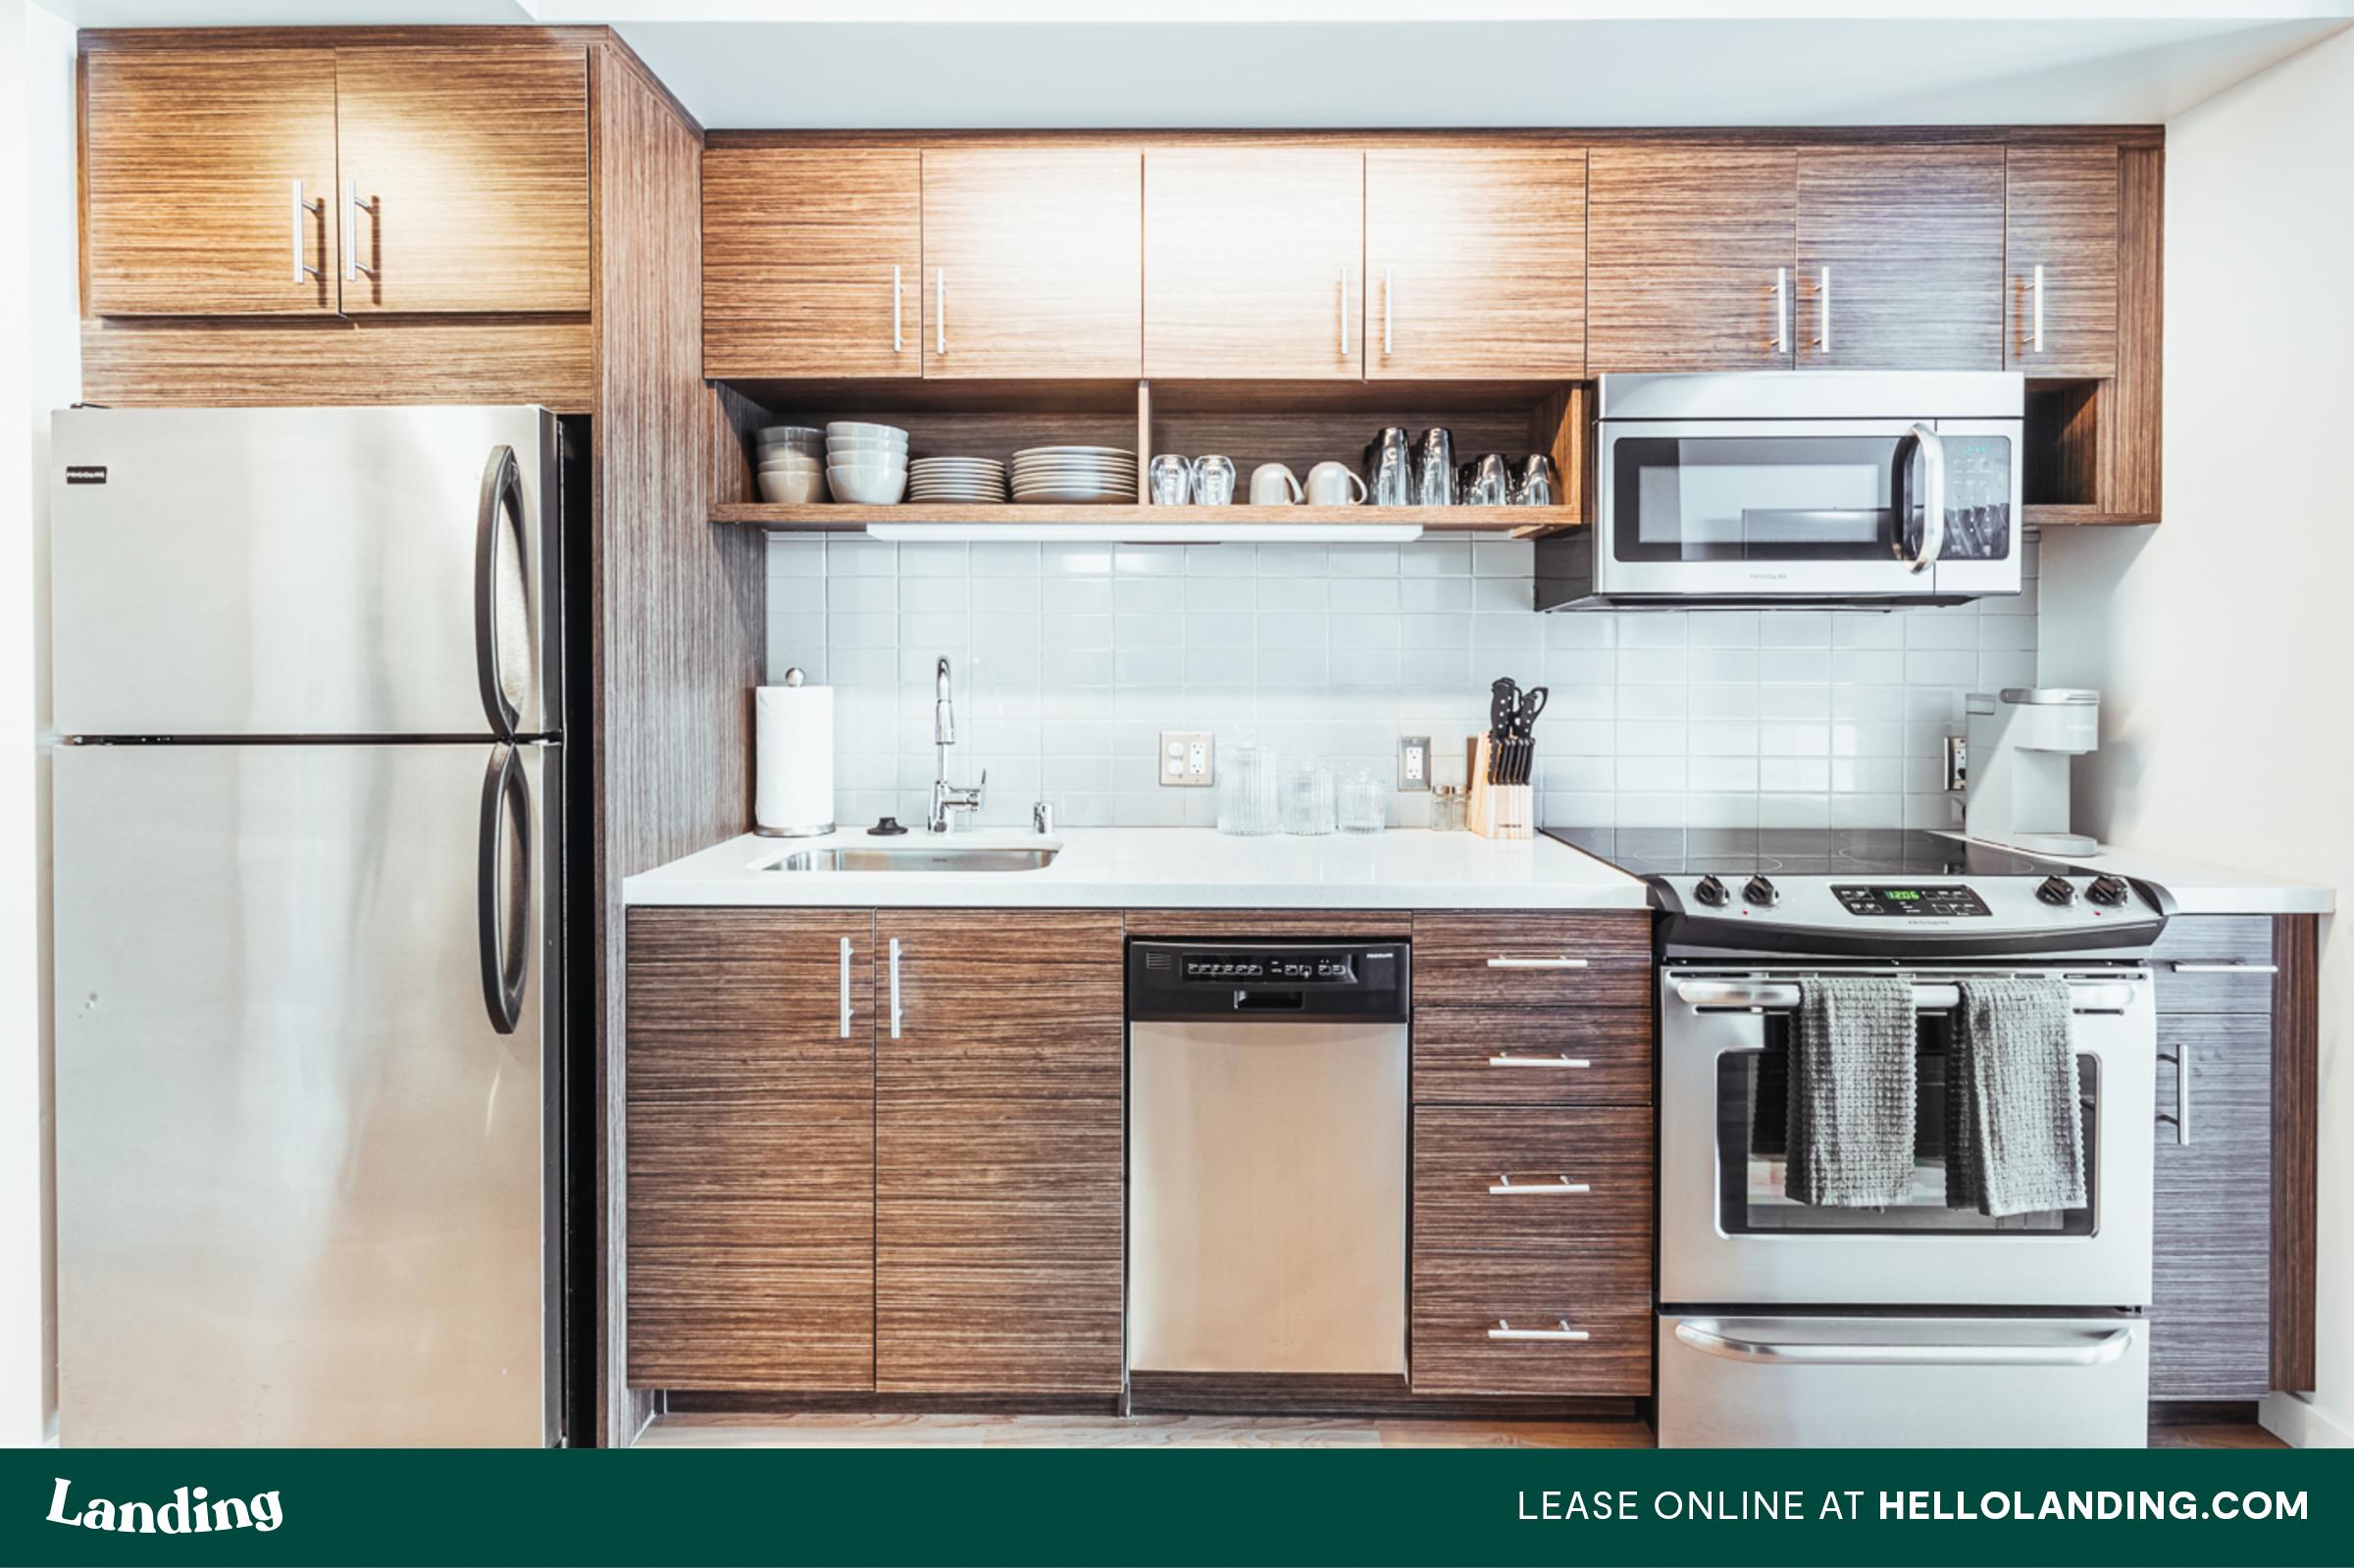 Aliso Apartments rental